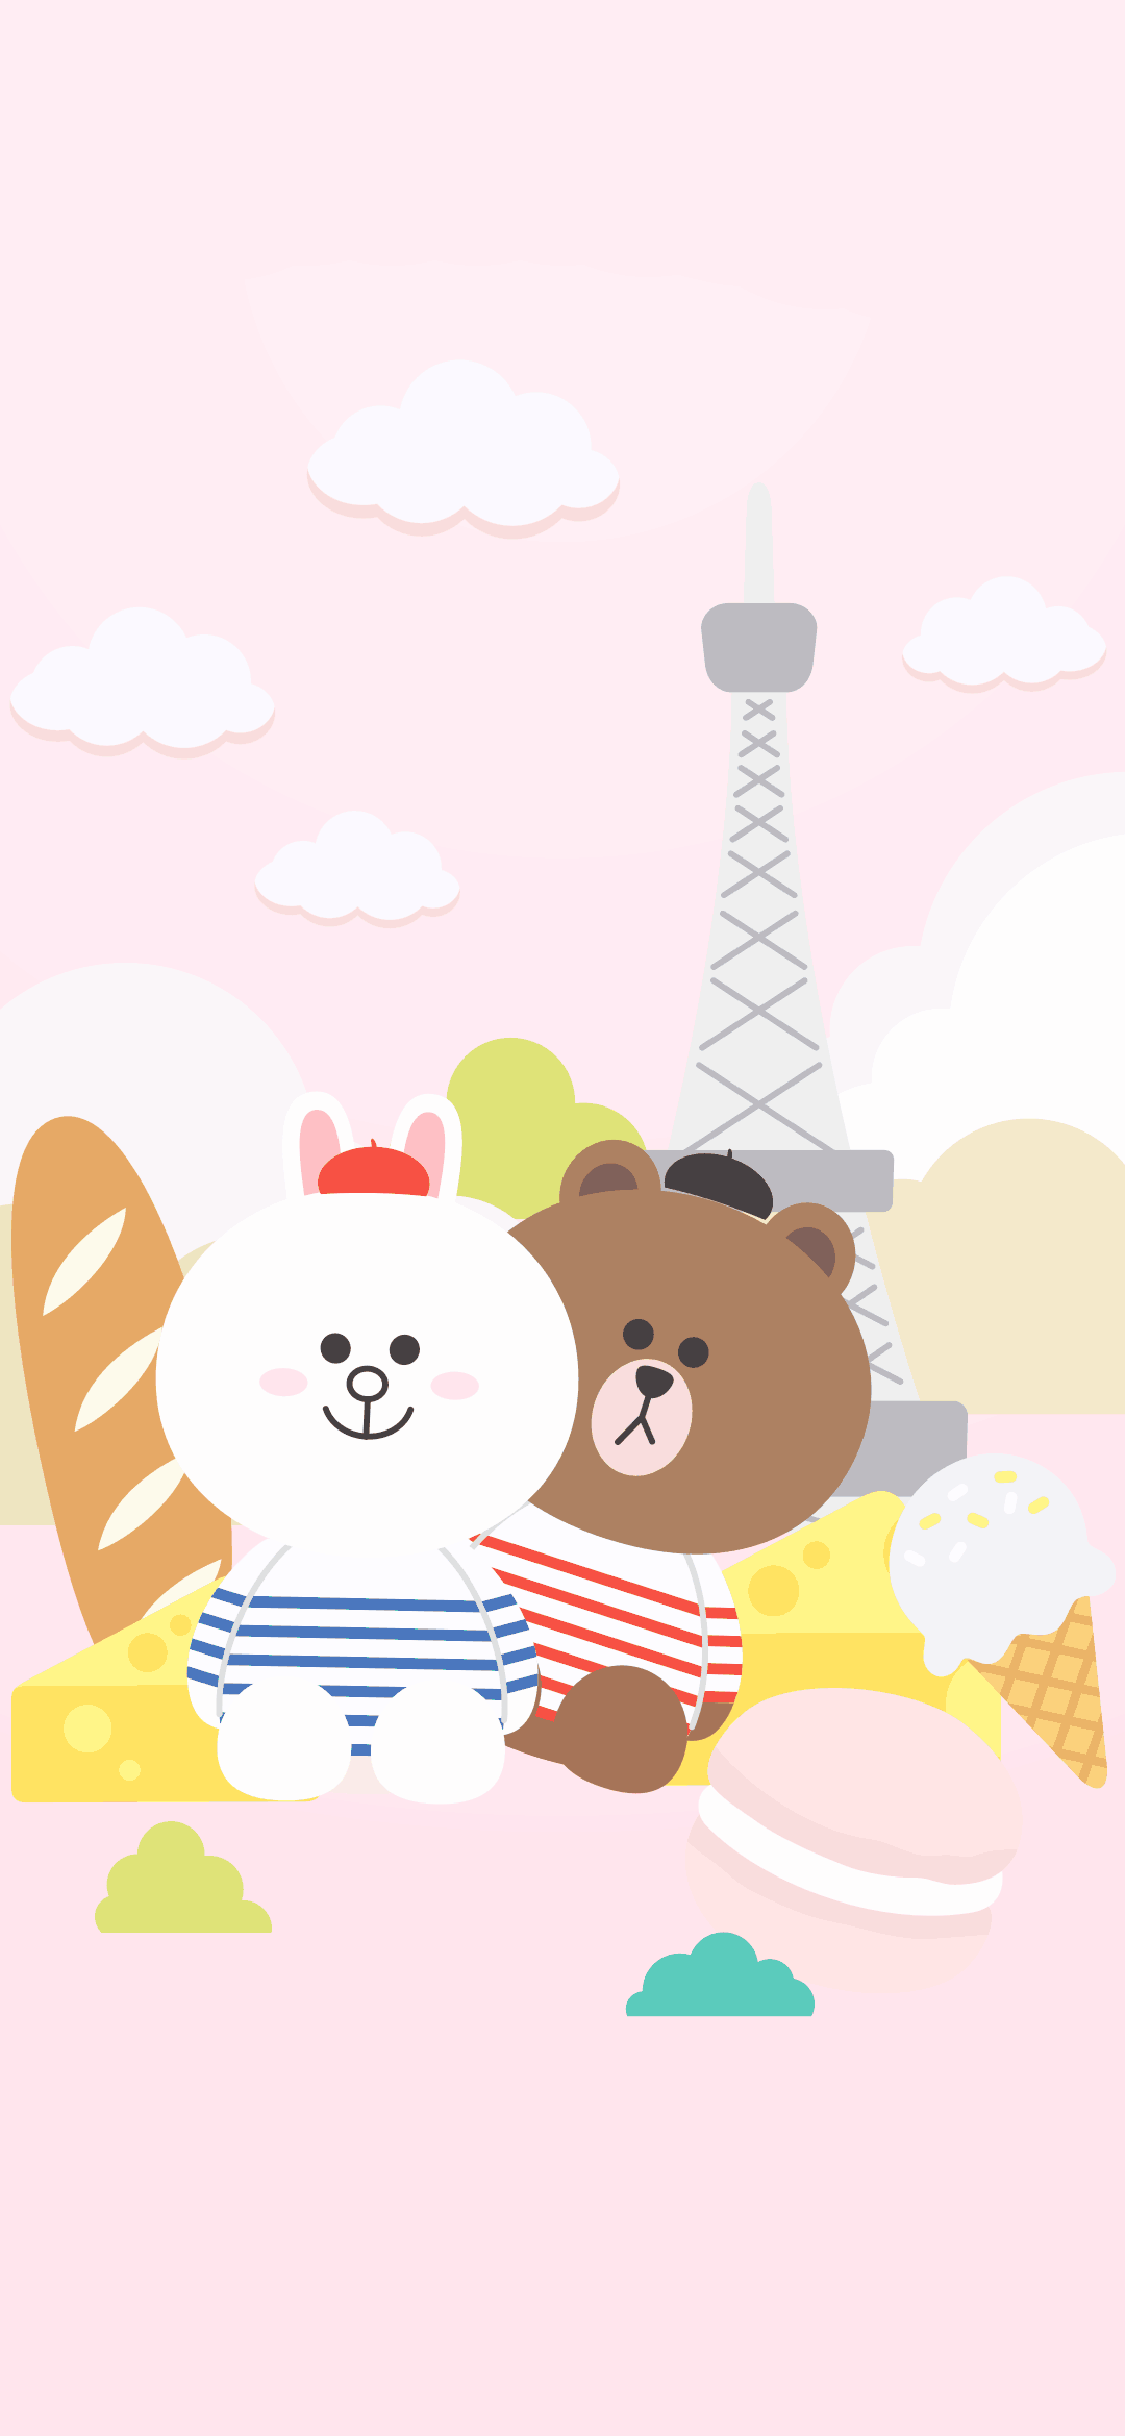 line friends 布朗熊 可妮兔 可爱 粉色 卡通